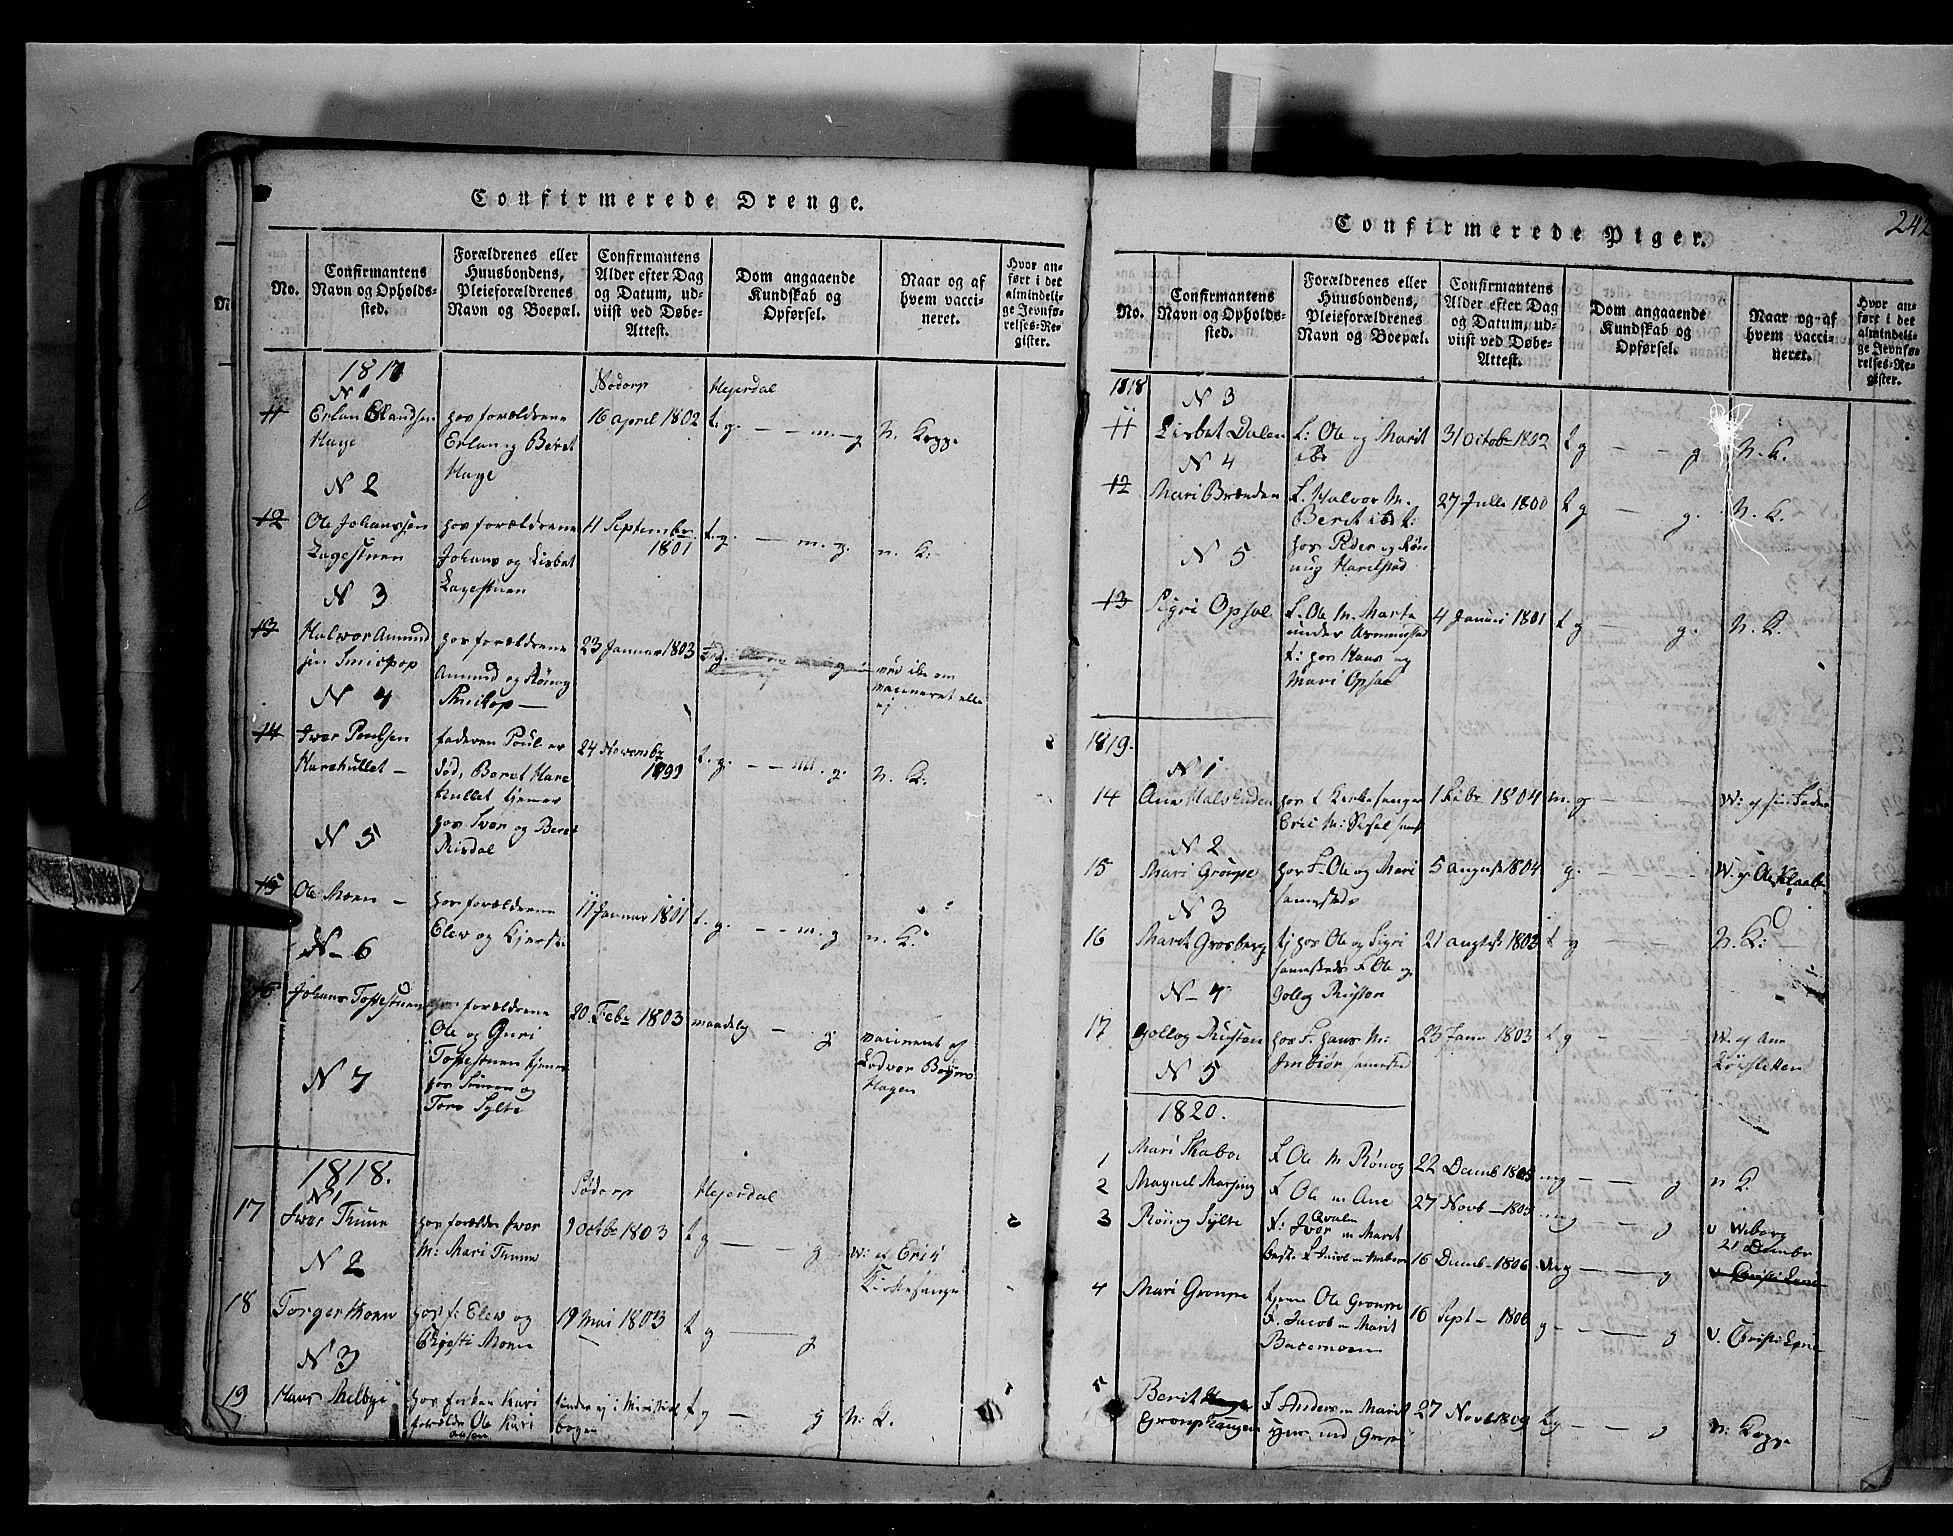 SAH, Fron prestekontor, H/Ha/Hab/L0003: Klokkerbok nr. 3, 1816-1850, s. 242